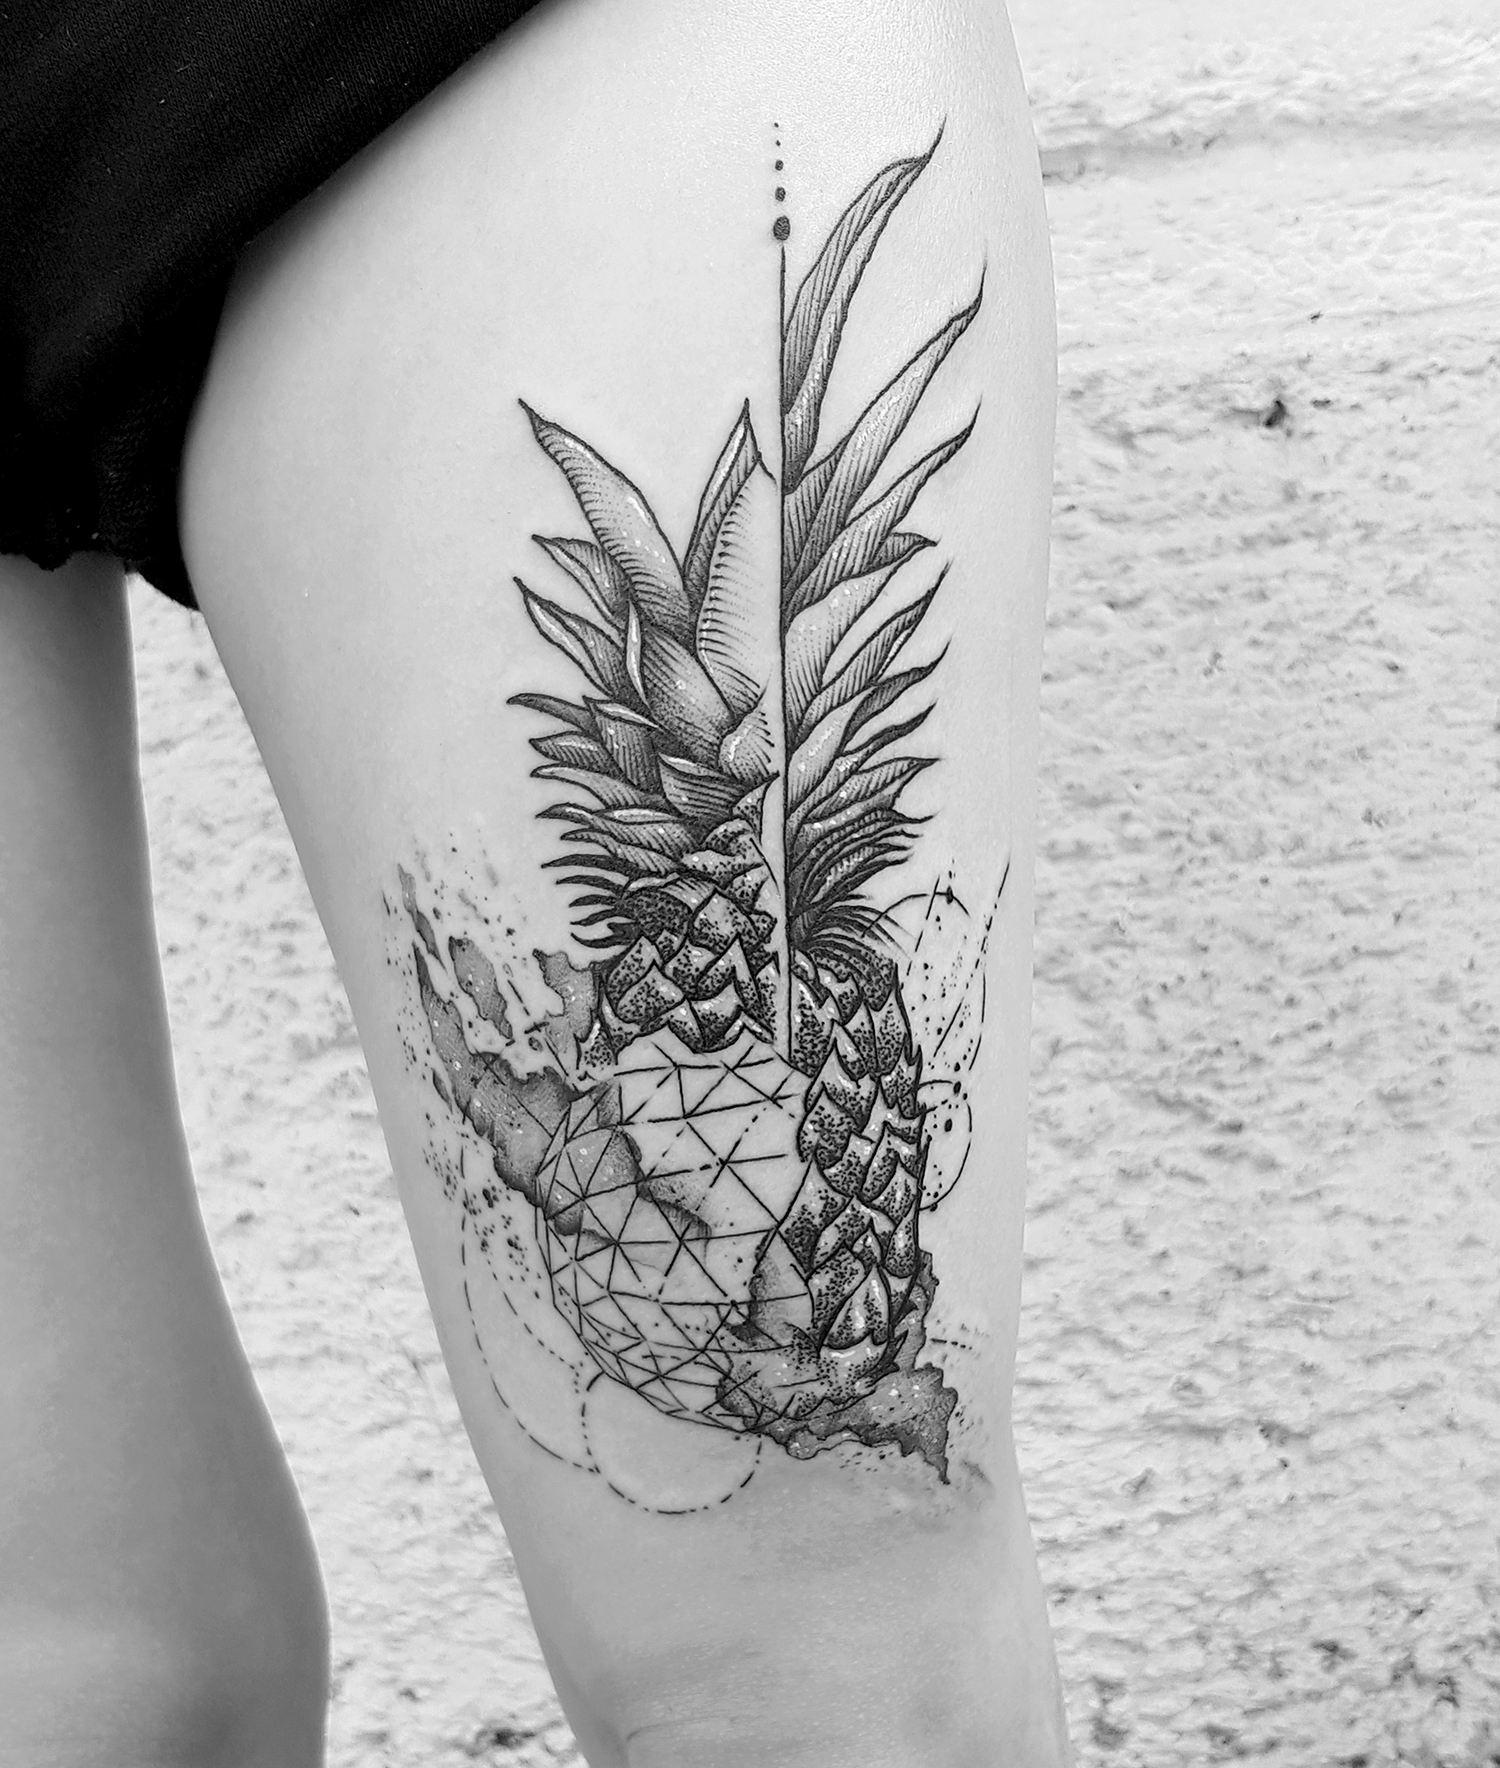 pineapple tattoo, sketch blackwork